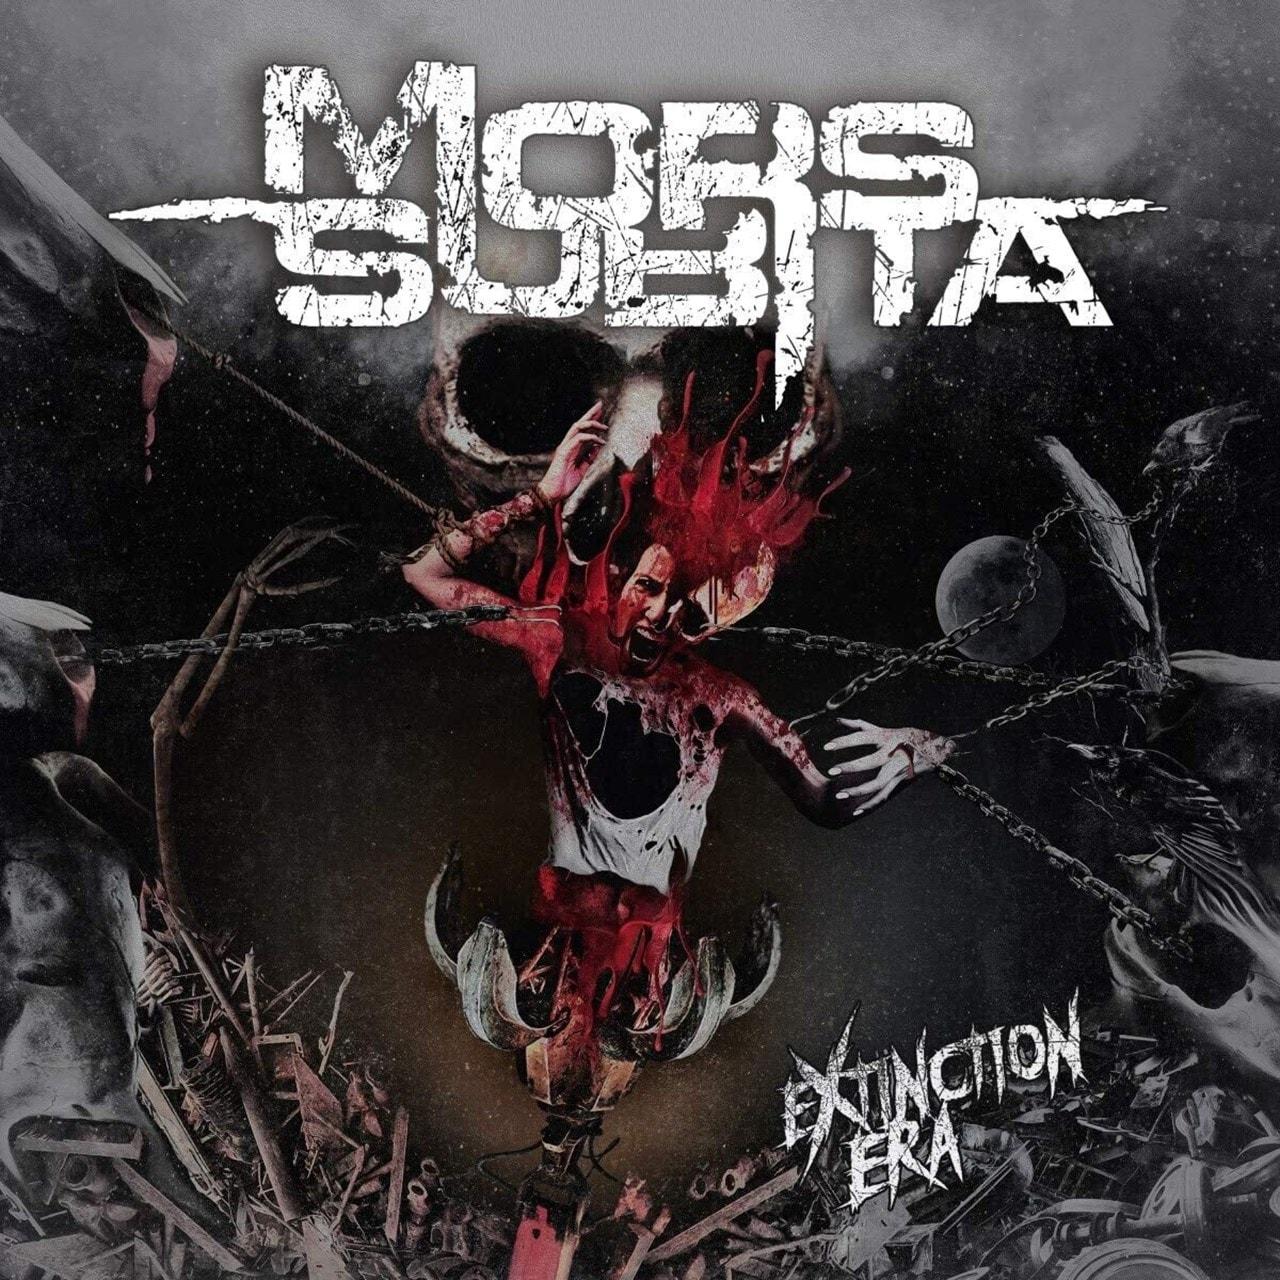 Extinction Era - 1